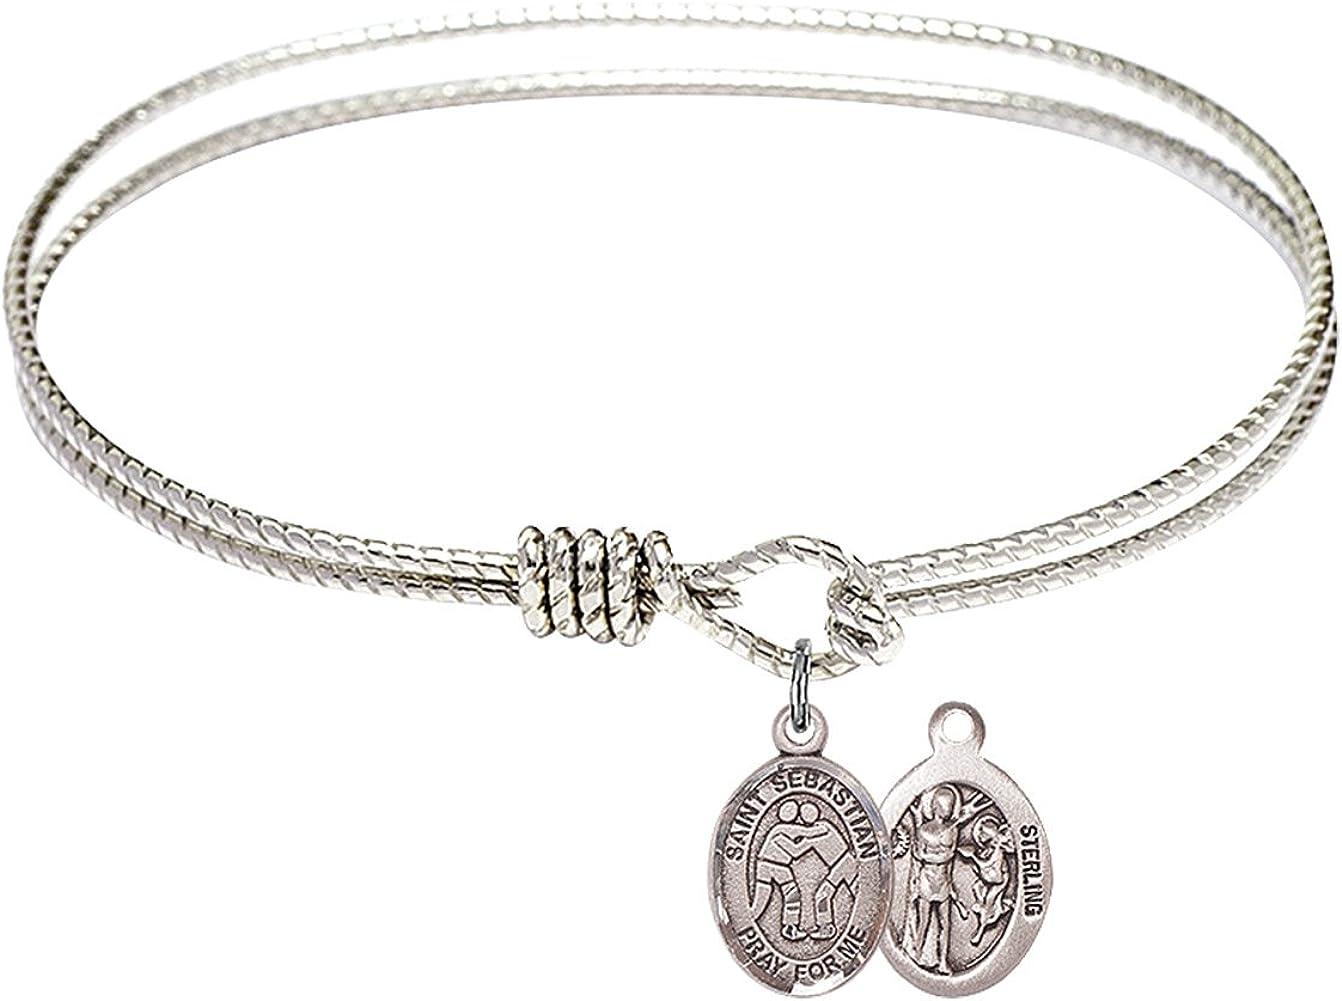 DiamondJewelryNY Double Loop Bangle Bracelet with a St Christopher//Football Charm.